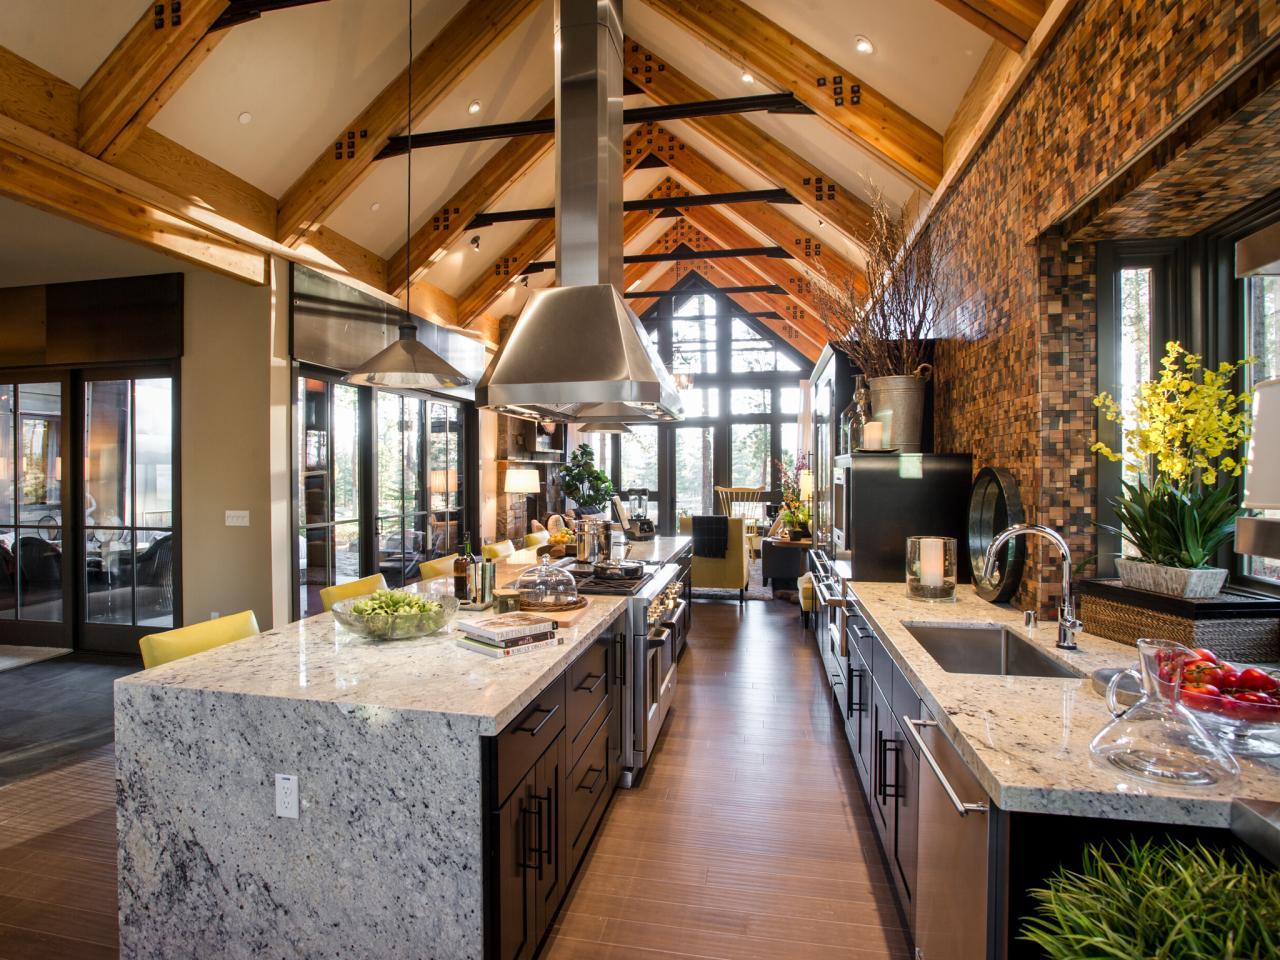 Large Open Kitchen With Long Granite Island – Hgtv Dream Home 2014 Floor Plan